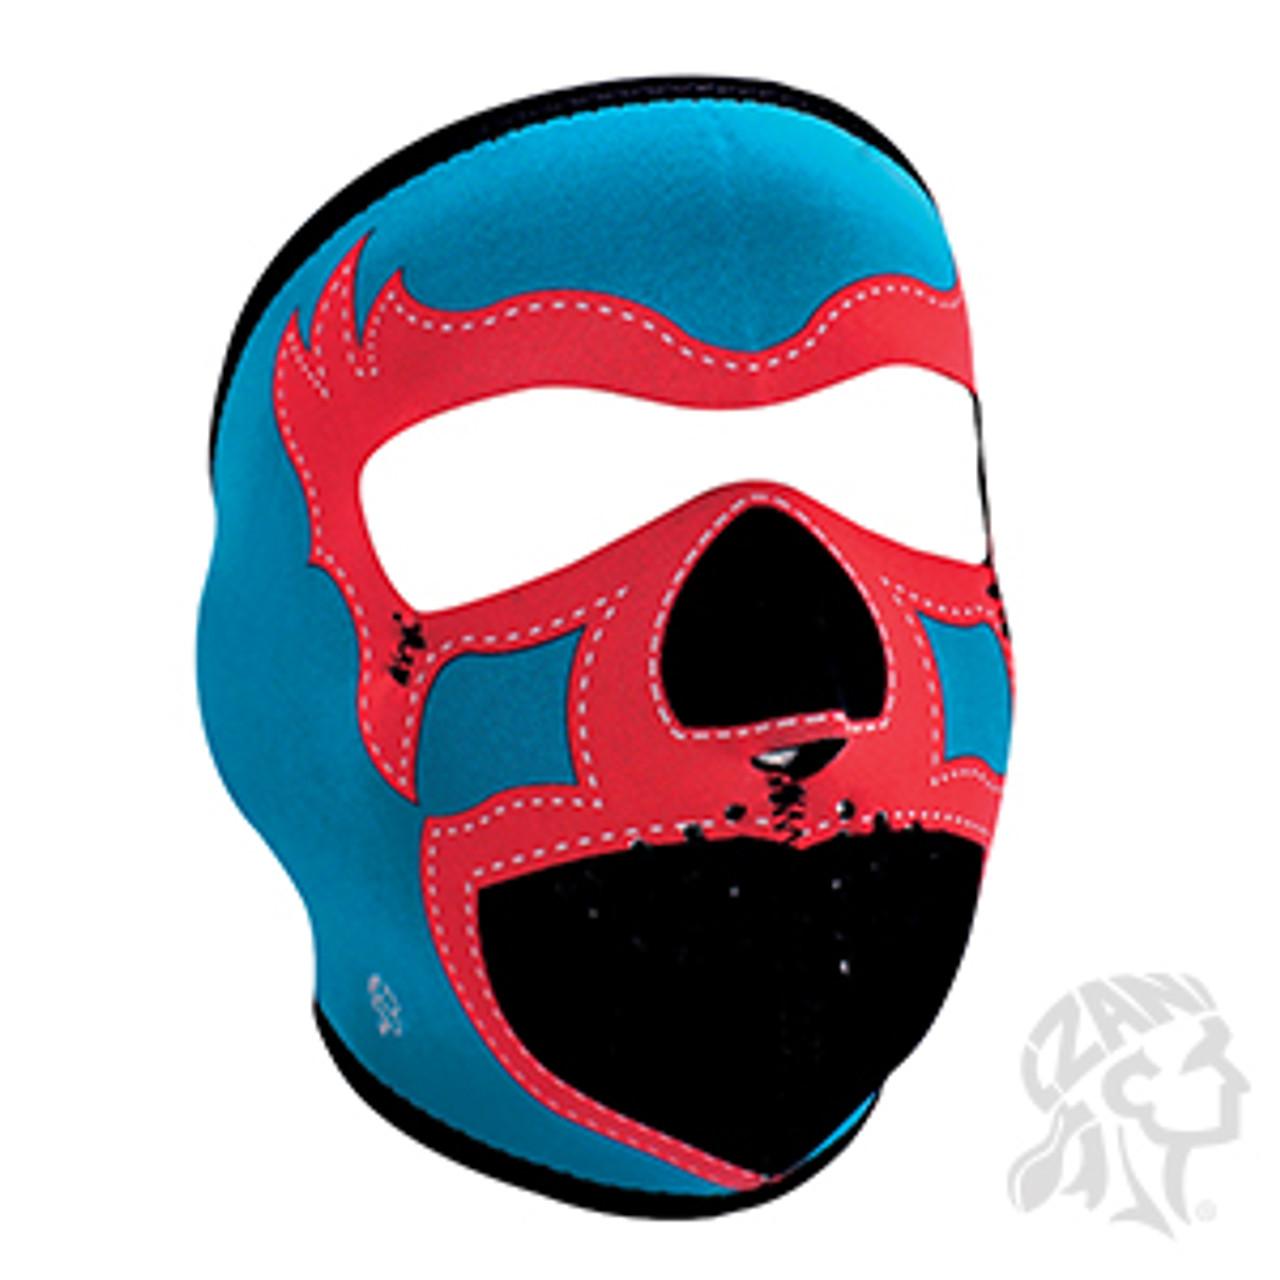 Lucha Libre in Blue Zan Headgear Neoprene Full-Face Mask